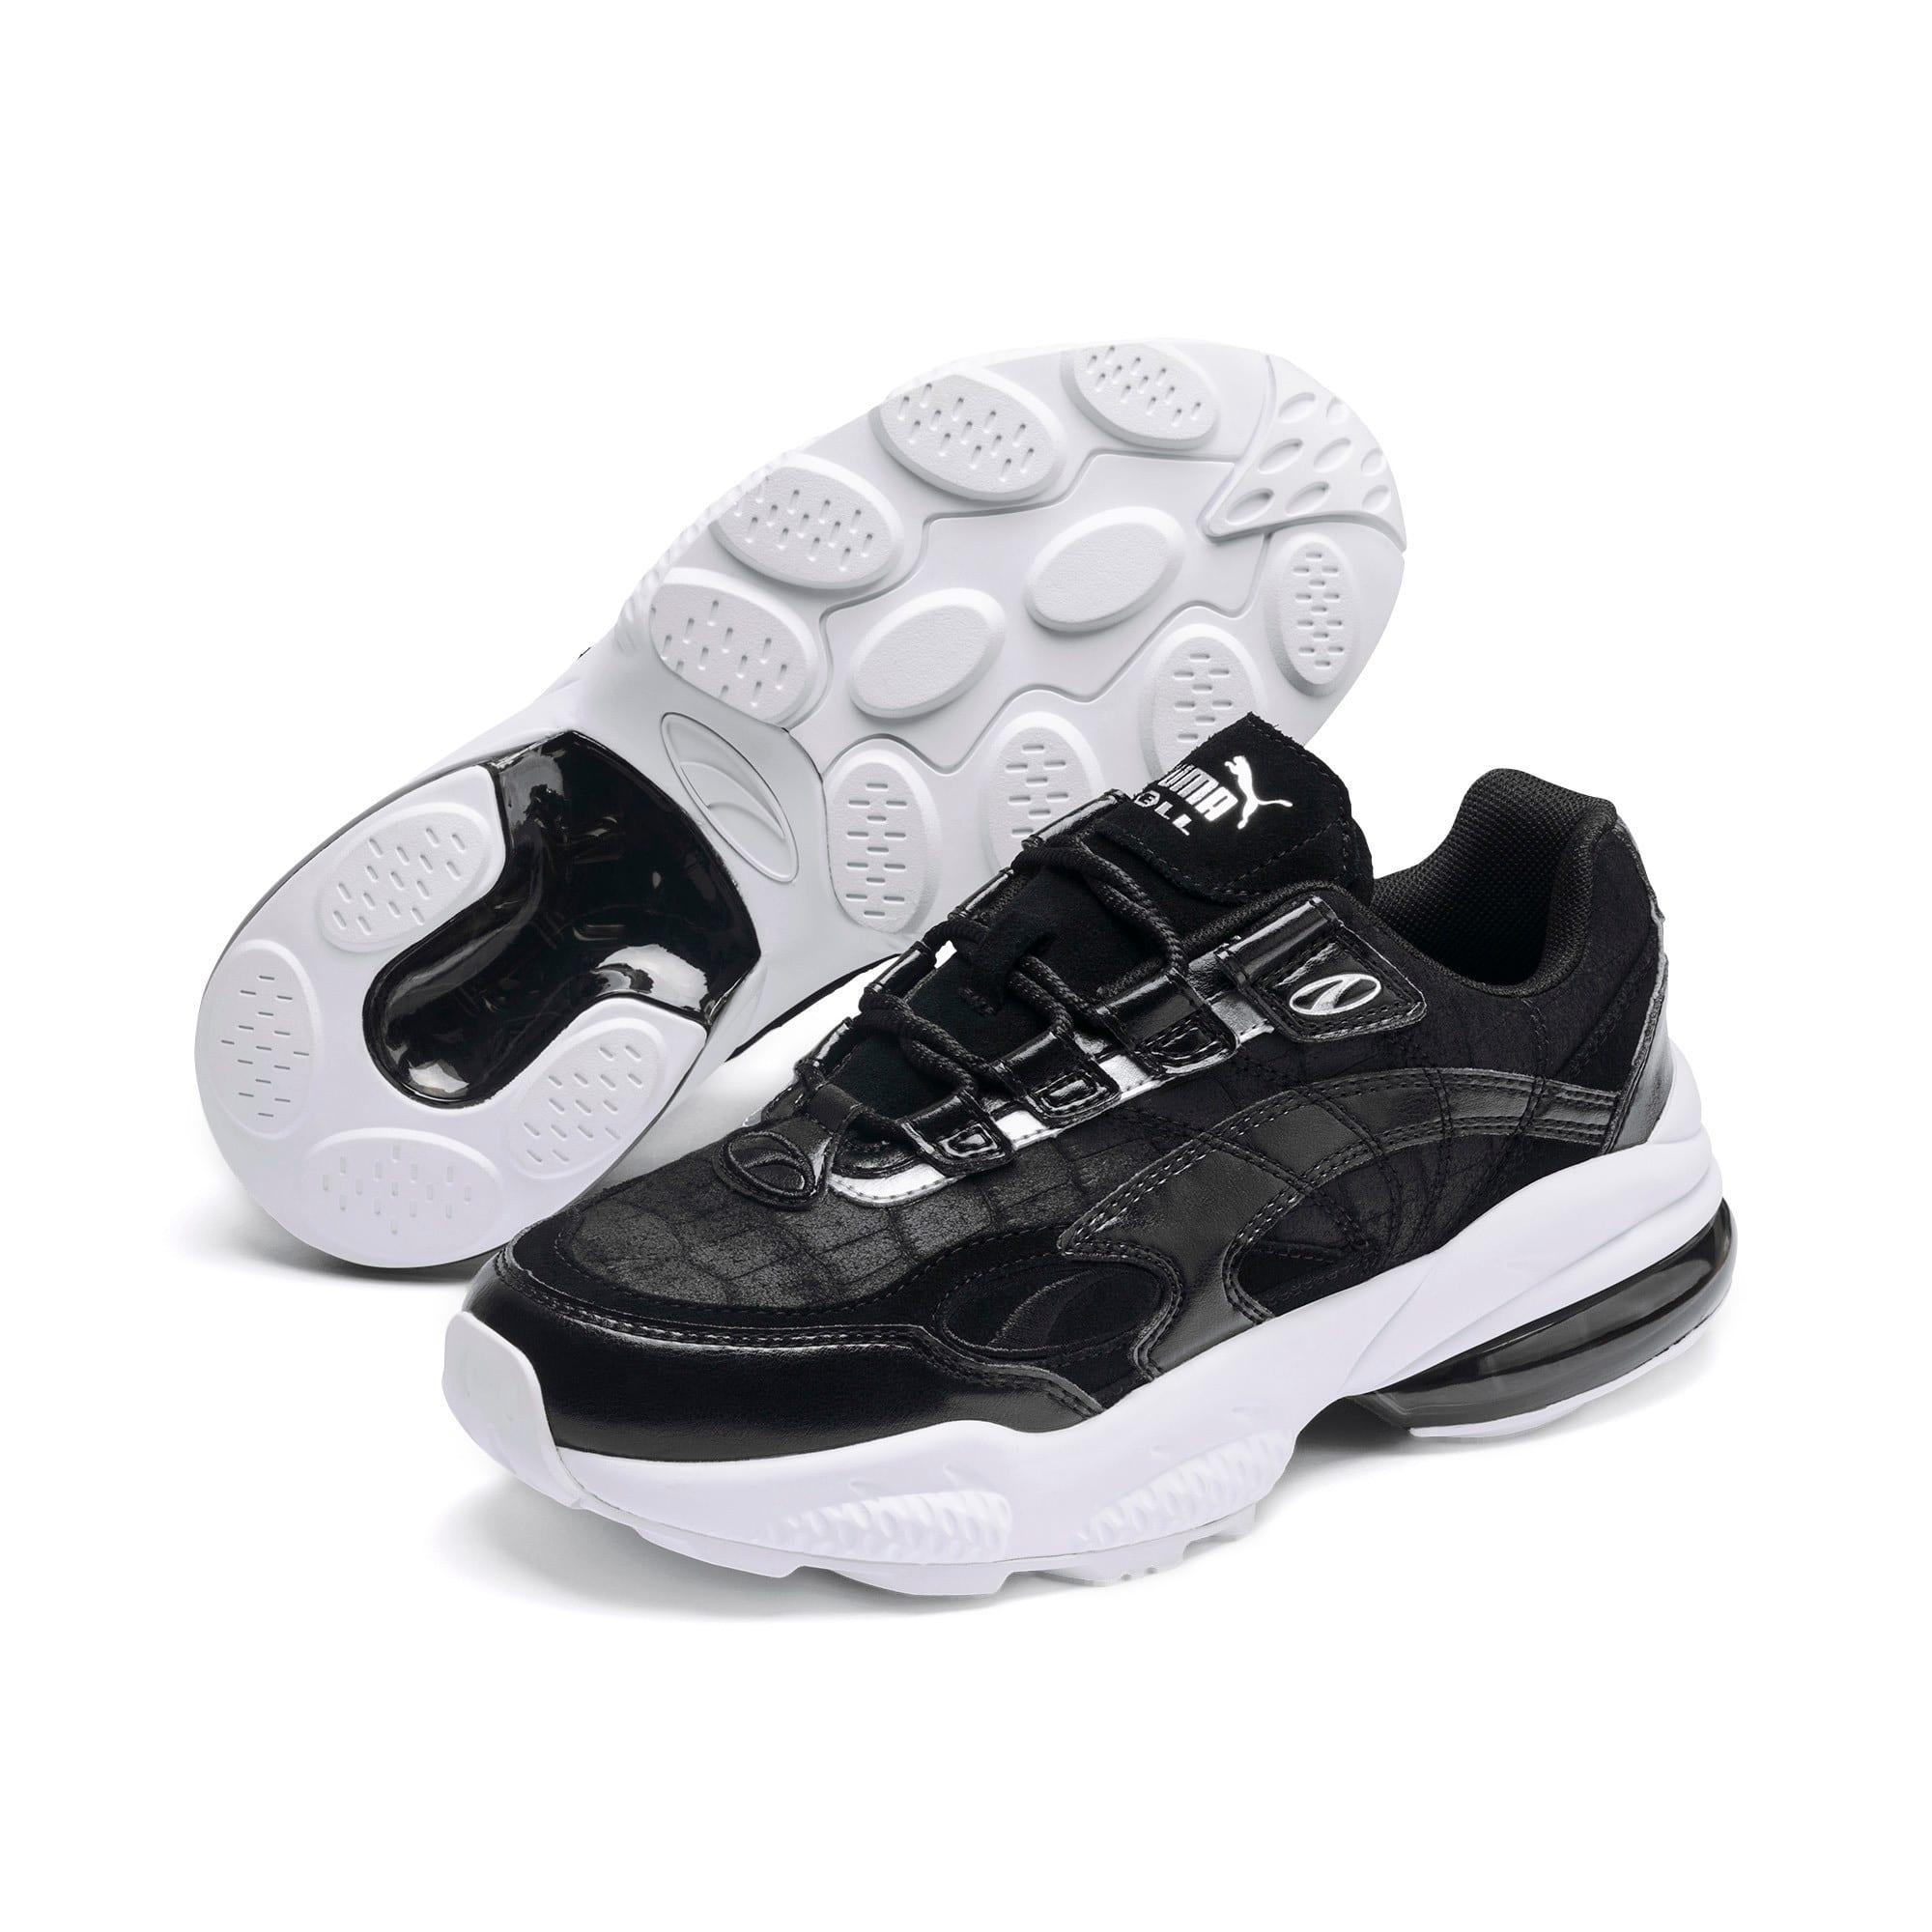 Thumbnail 3 of CELL Venom Hypertech Women's Sneakers, Puma Black, medium